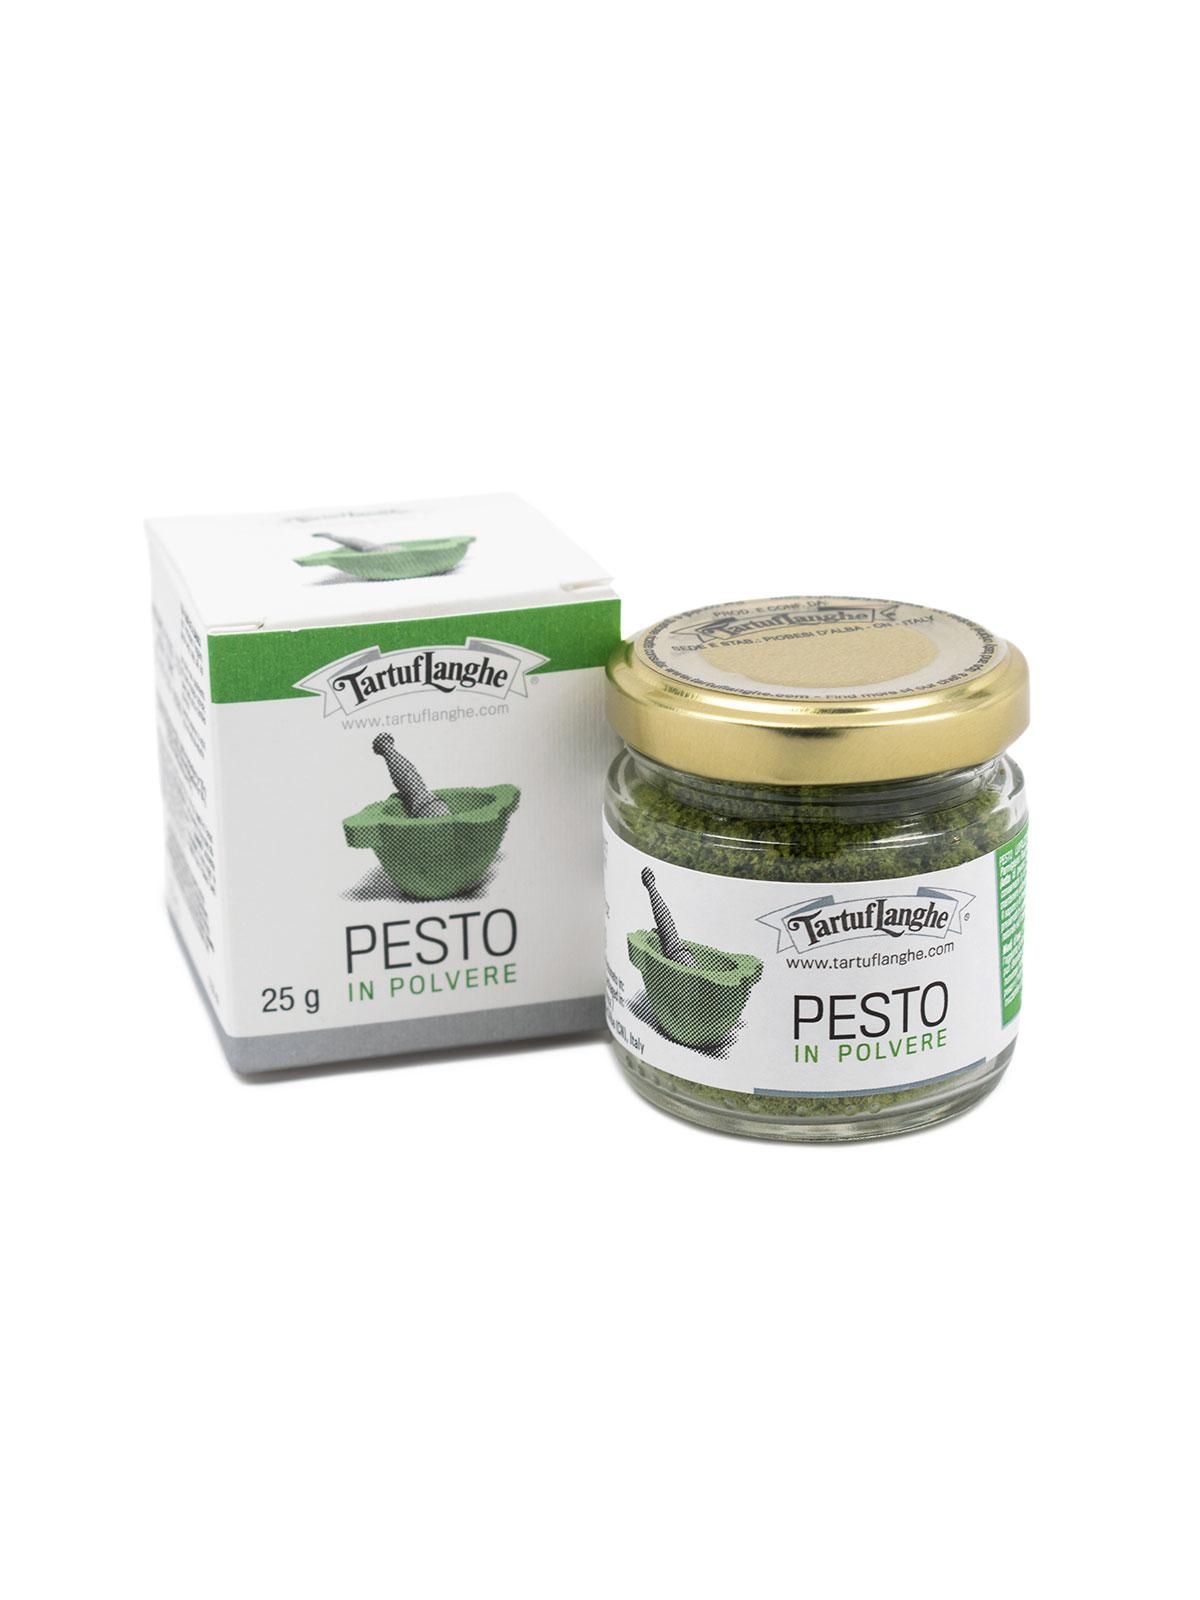 Pesto Powder - Pantry - Buon'Italia